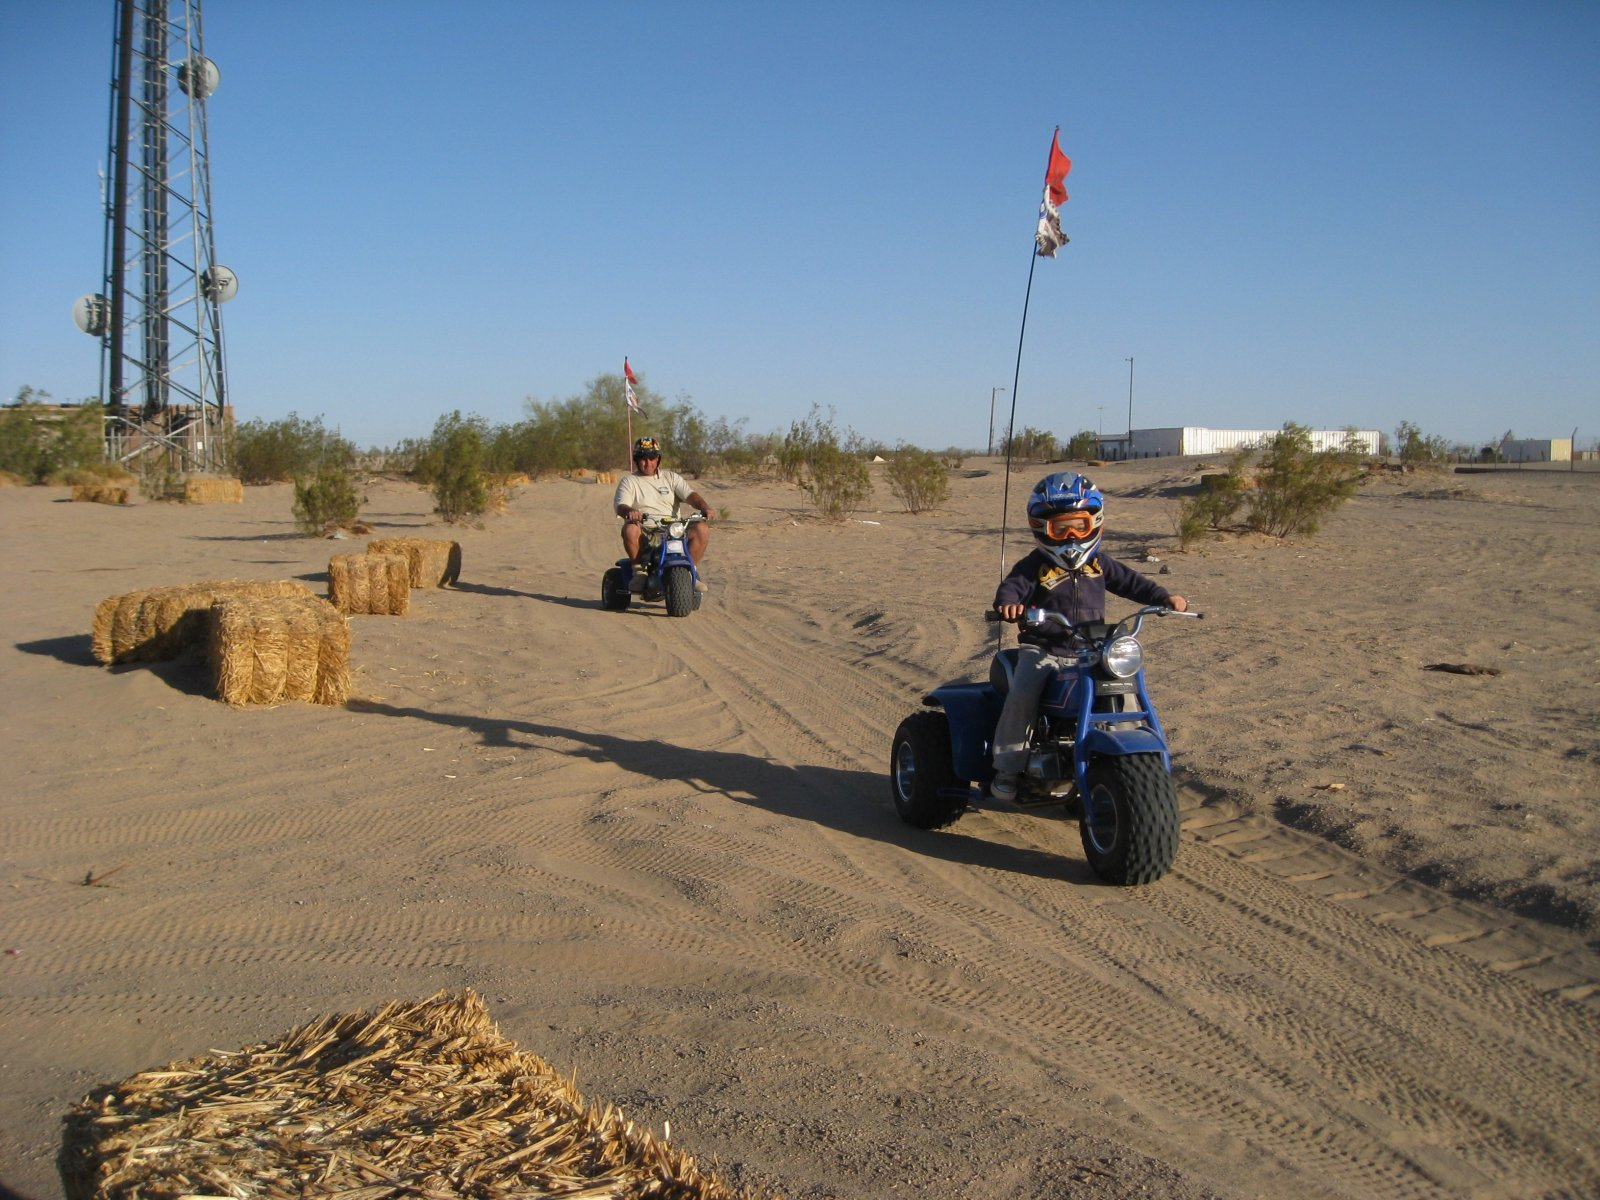 sebastian and andy 70 riding pound.jpg